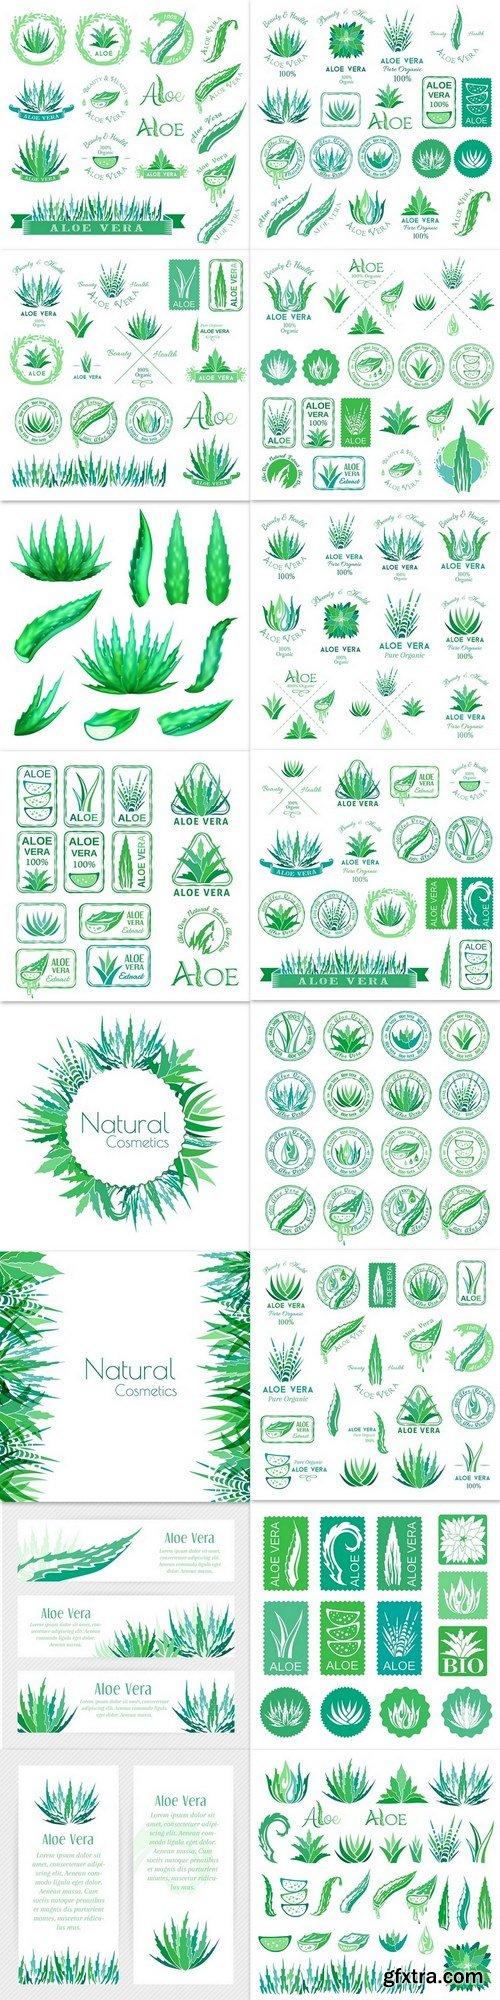 Aloe vera design elements. Logos, badges, icons